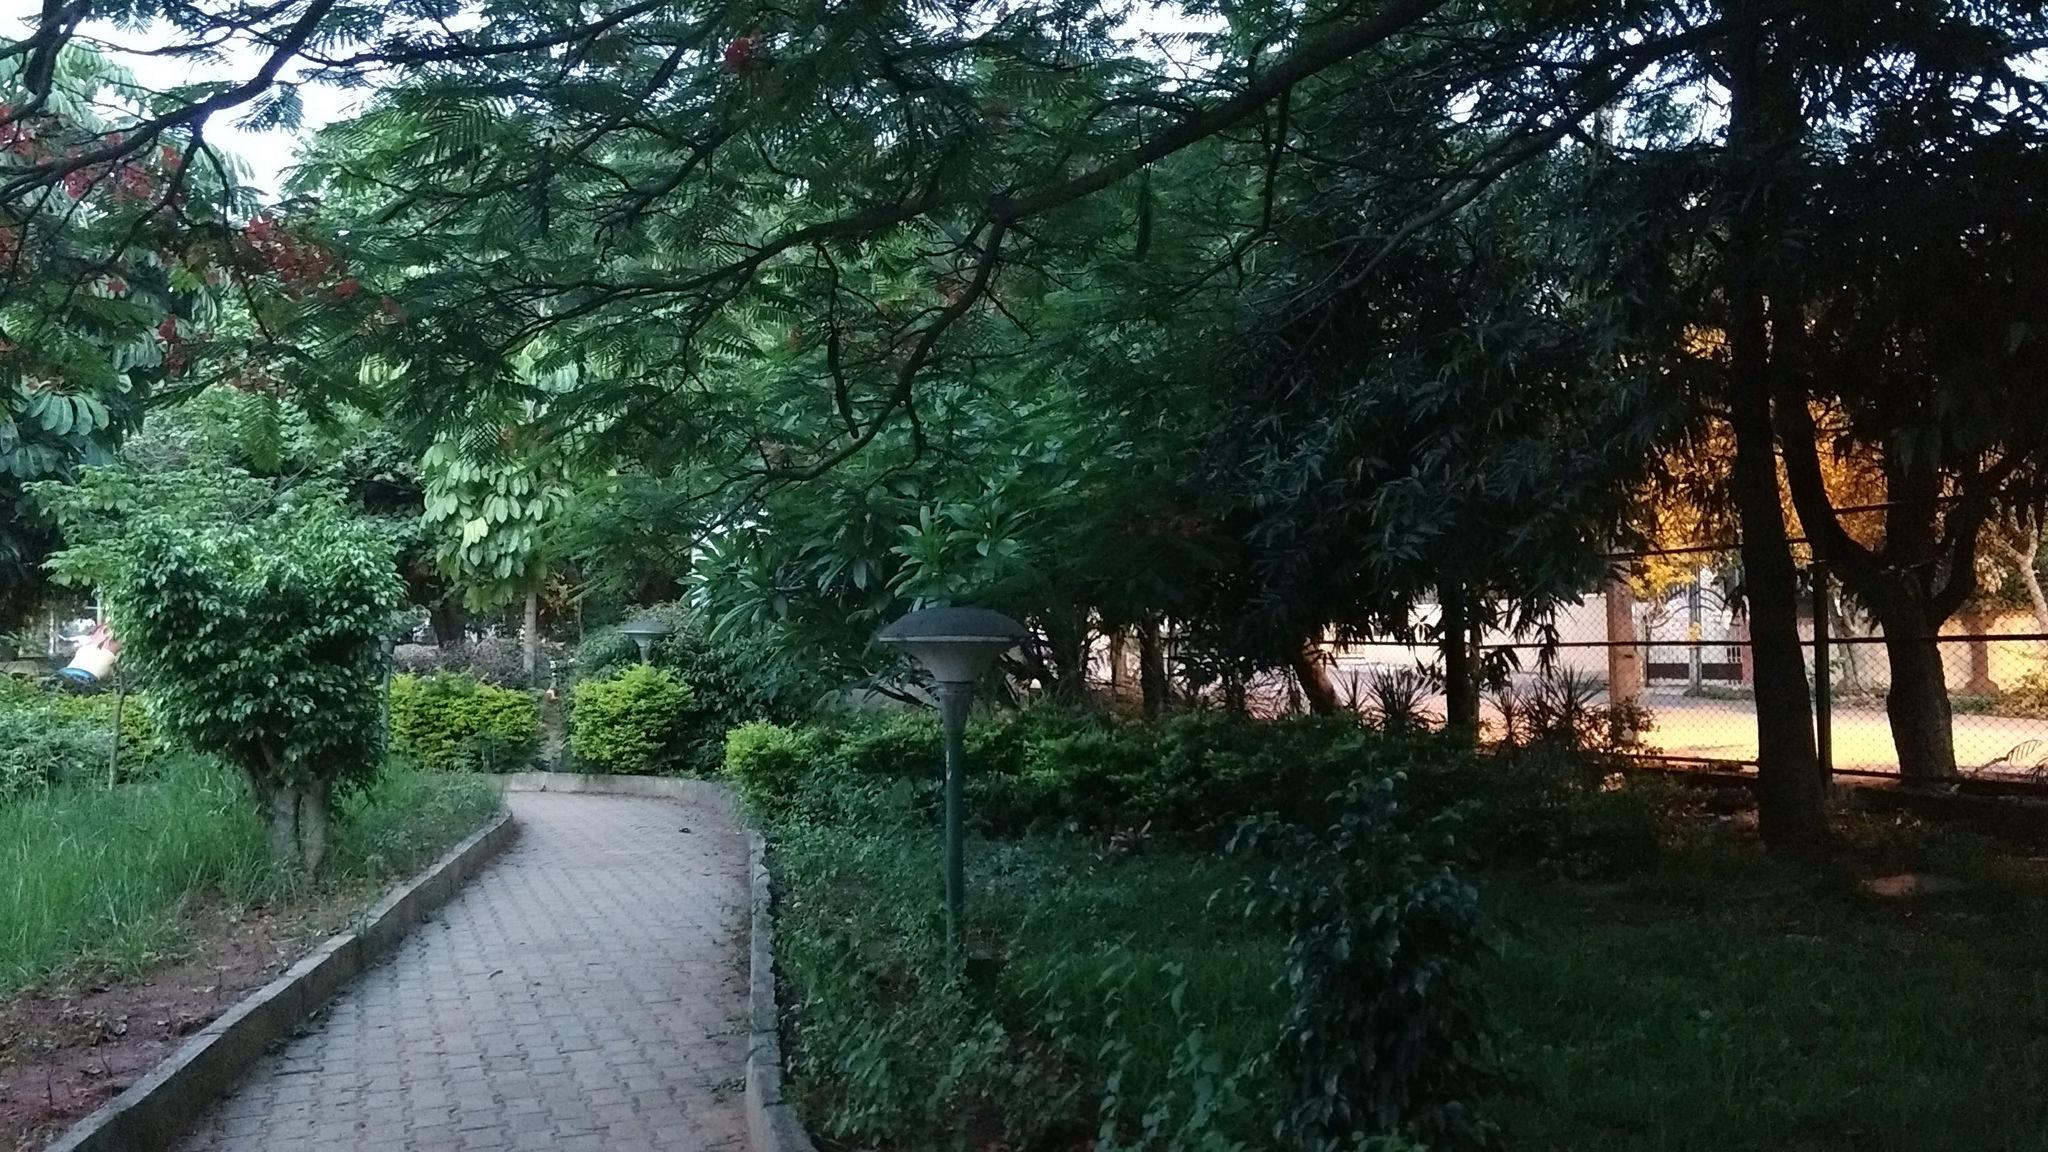 India-Bengaluru-parks-Nagawara